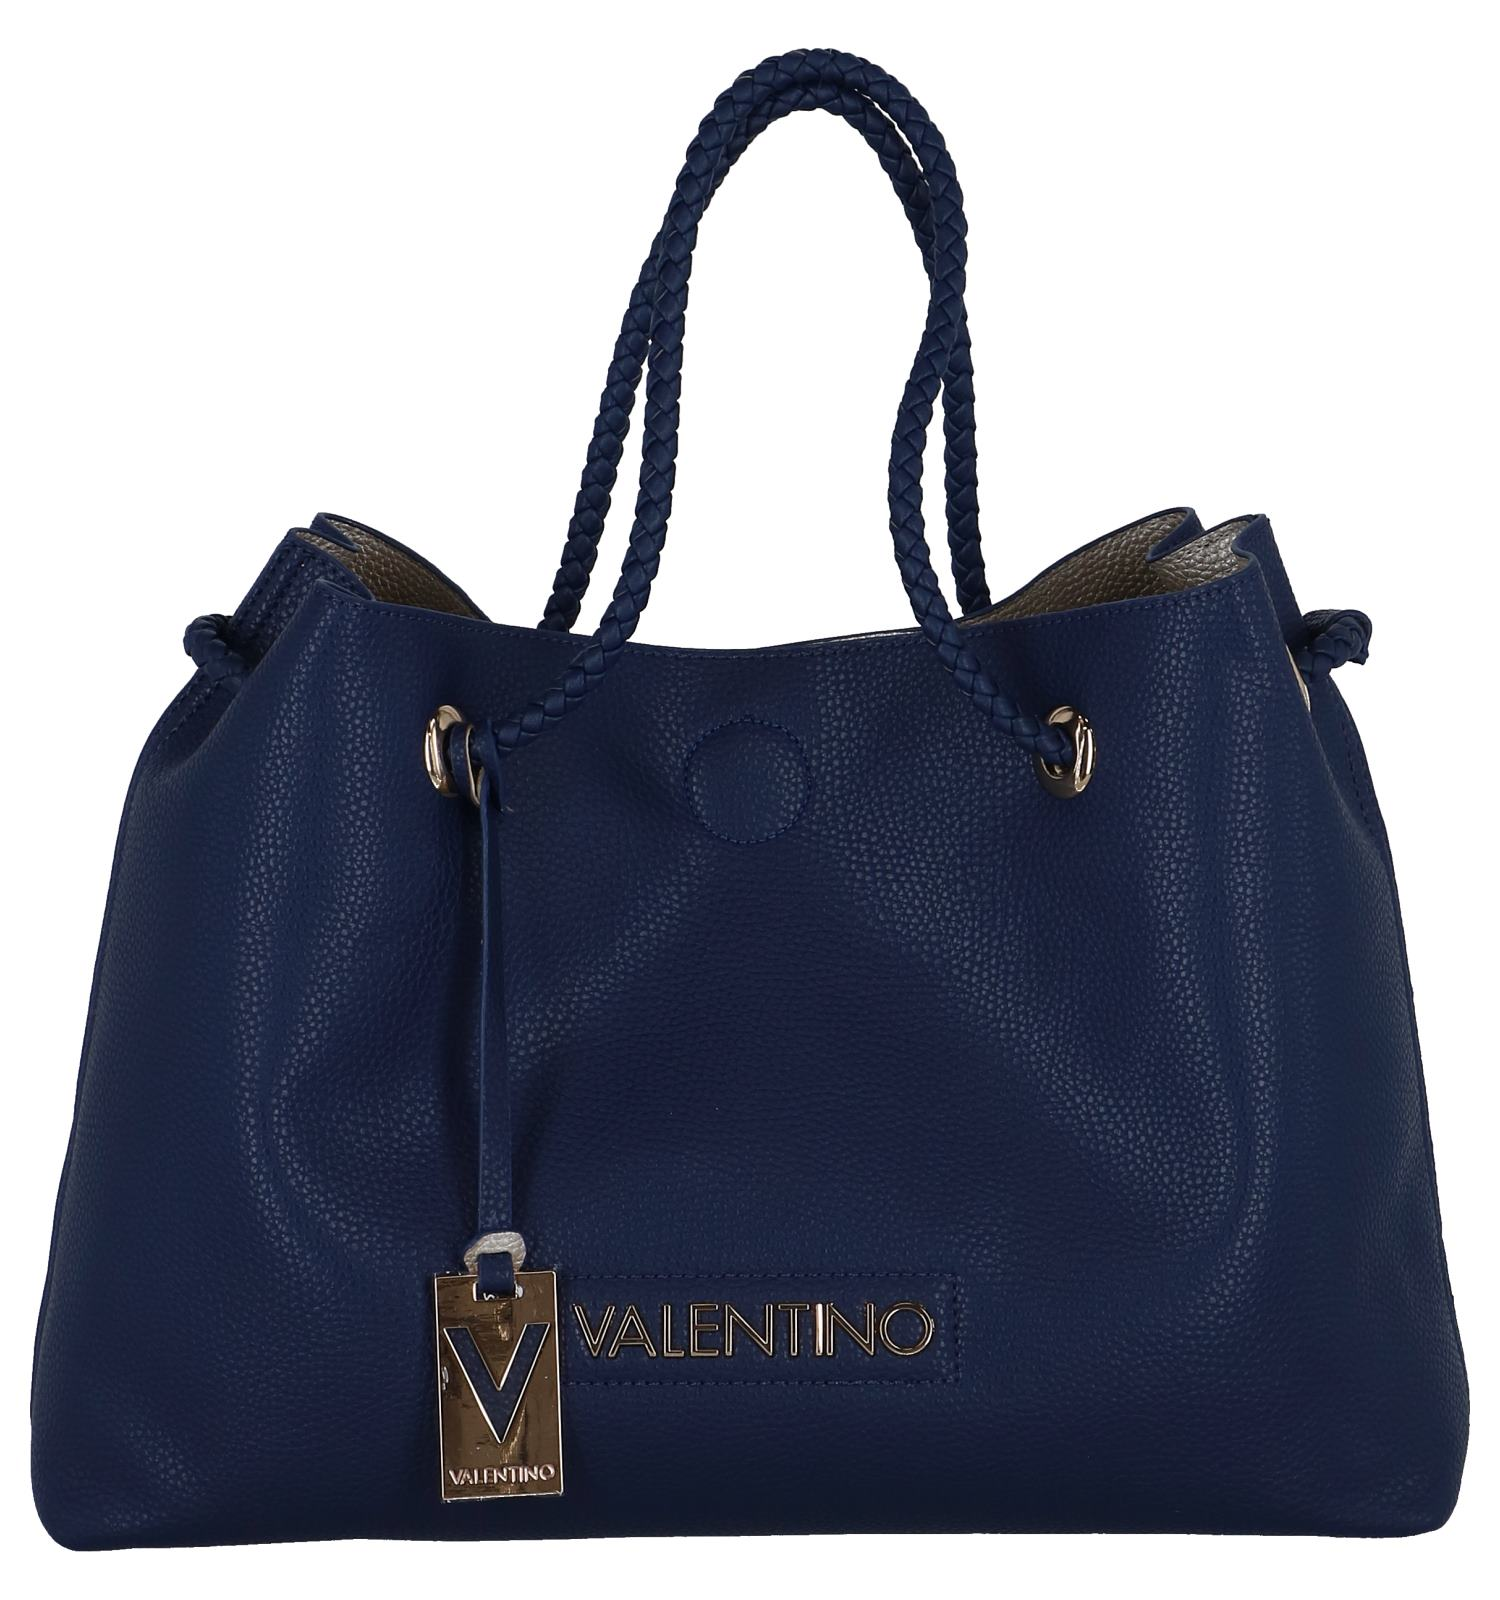 Schoudertas Donkerblauwe Omkeerbare Handbags Corsair Valentino trhQCxsd